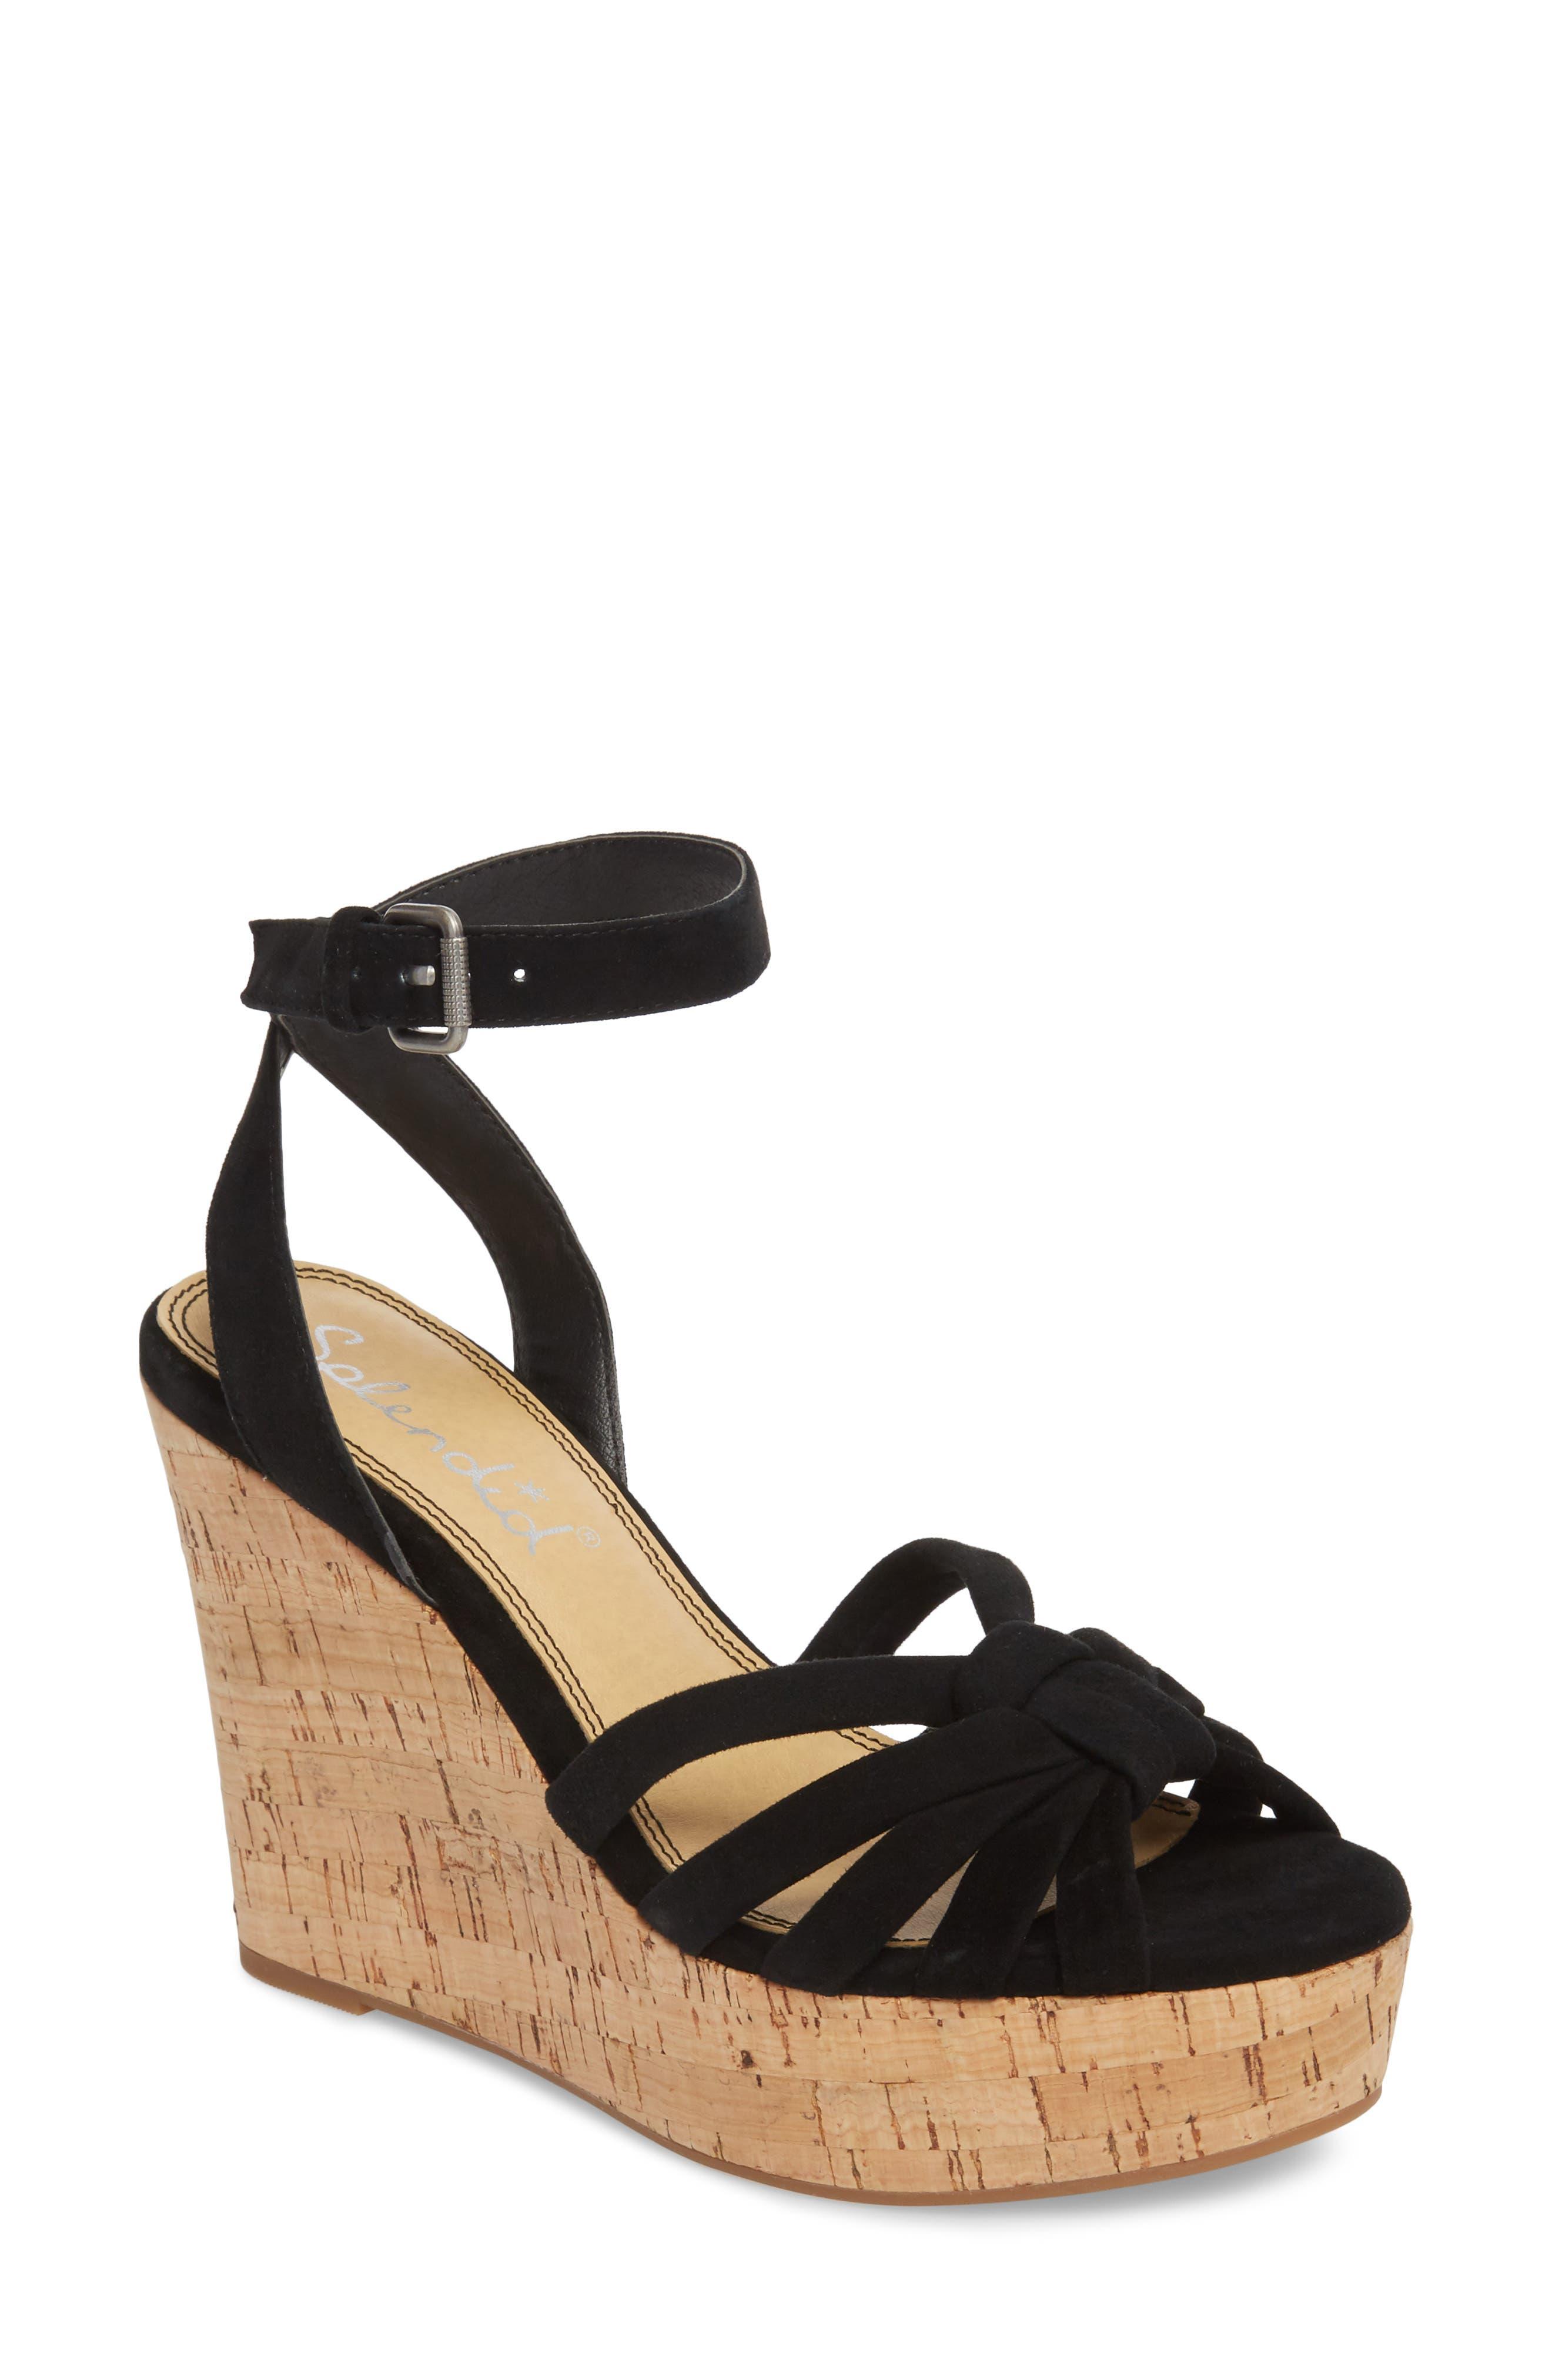 Fallon Wedge Sandal,                         Main,                         color, BLACK SUEDE